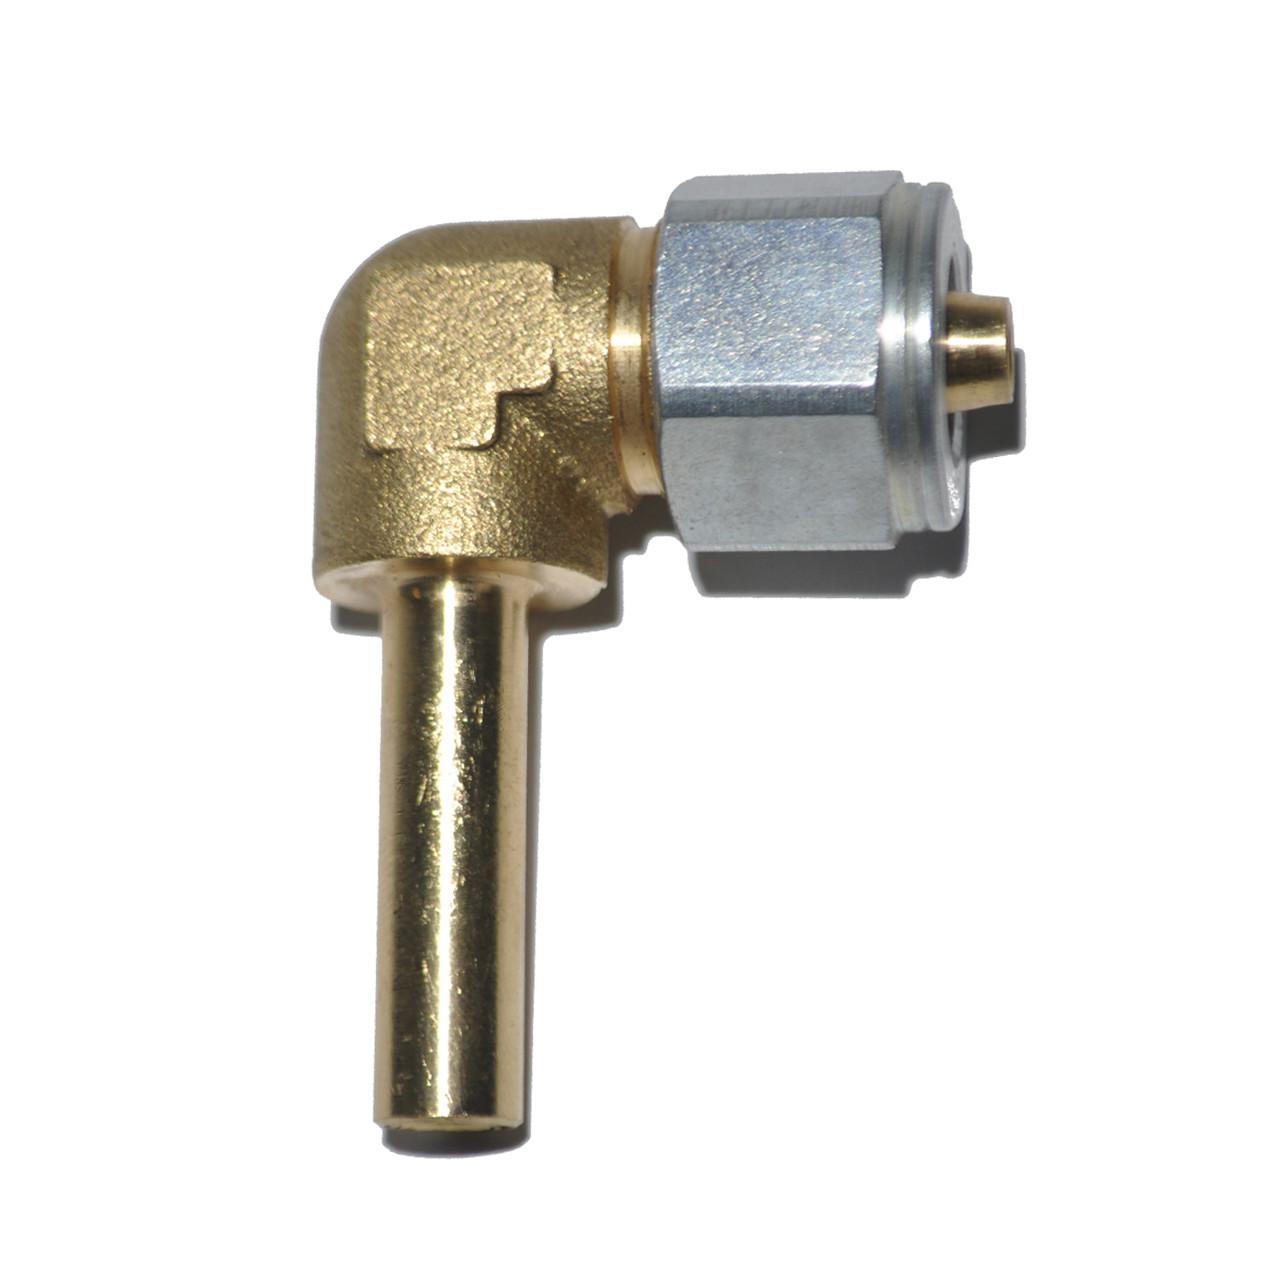 Переходник соедин. D6-D8 угловой  гайка+ниппель, для термопластик. трубки, FARO, шт